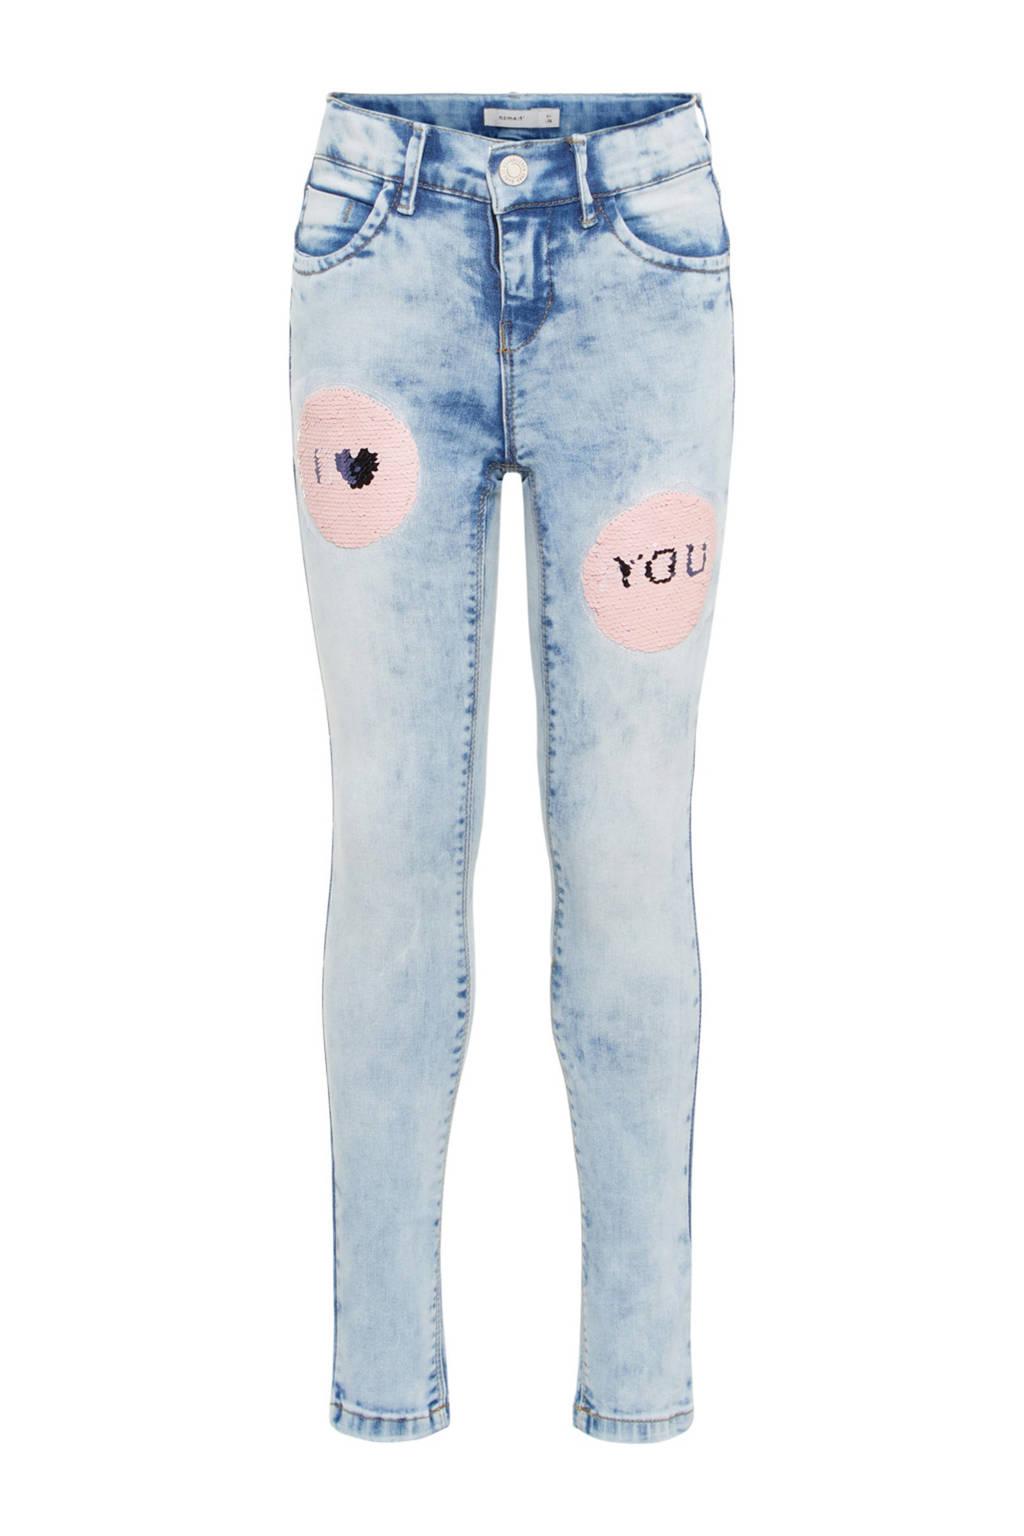 name it skinny jeans Polly met pailletten, Light denim